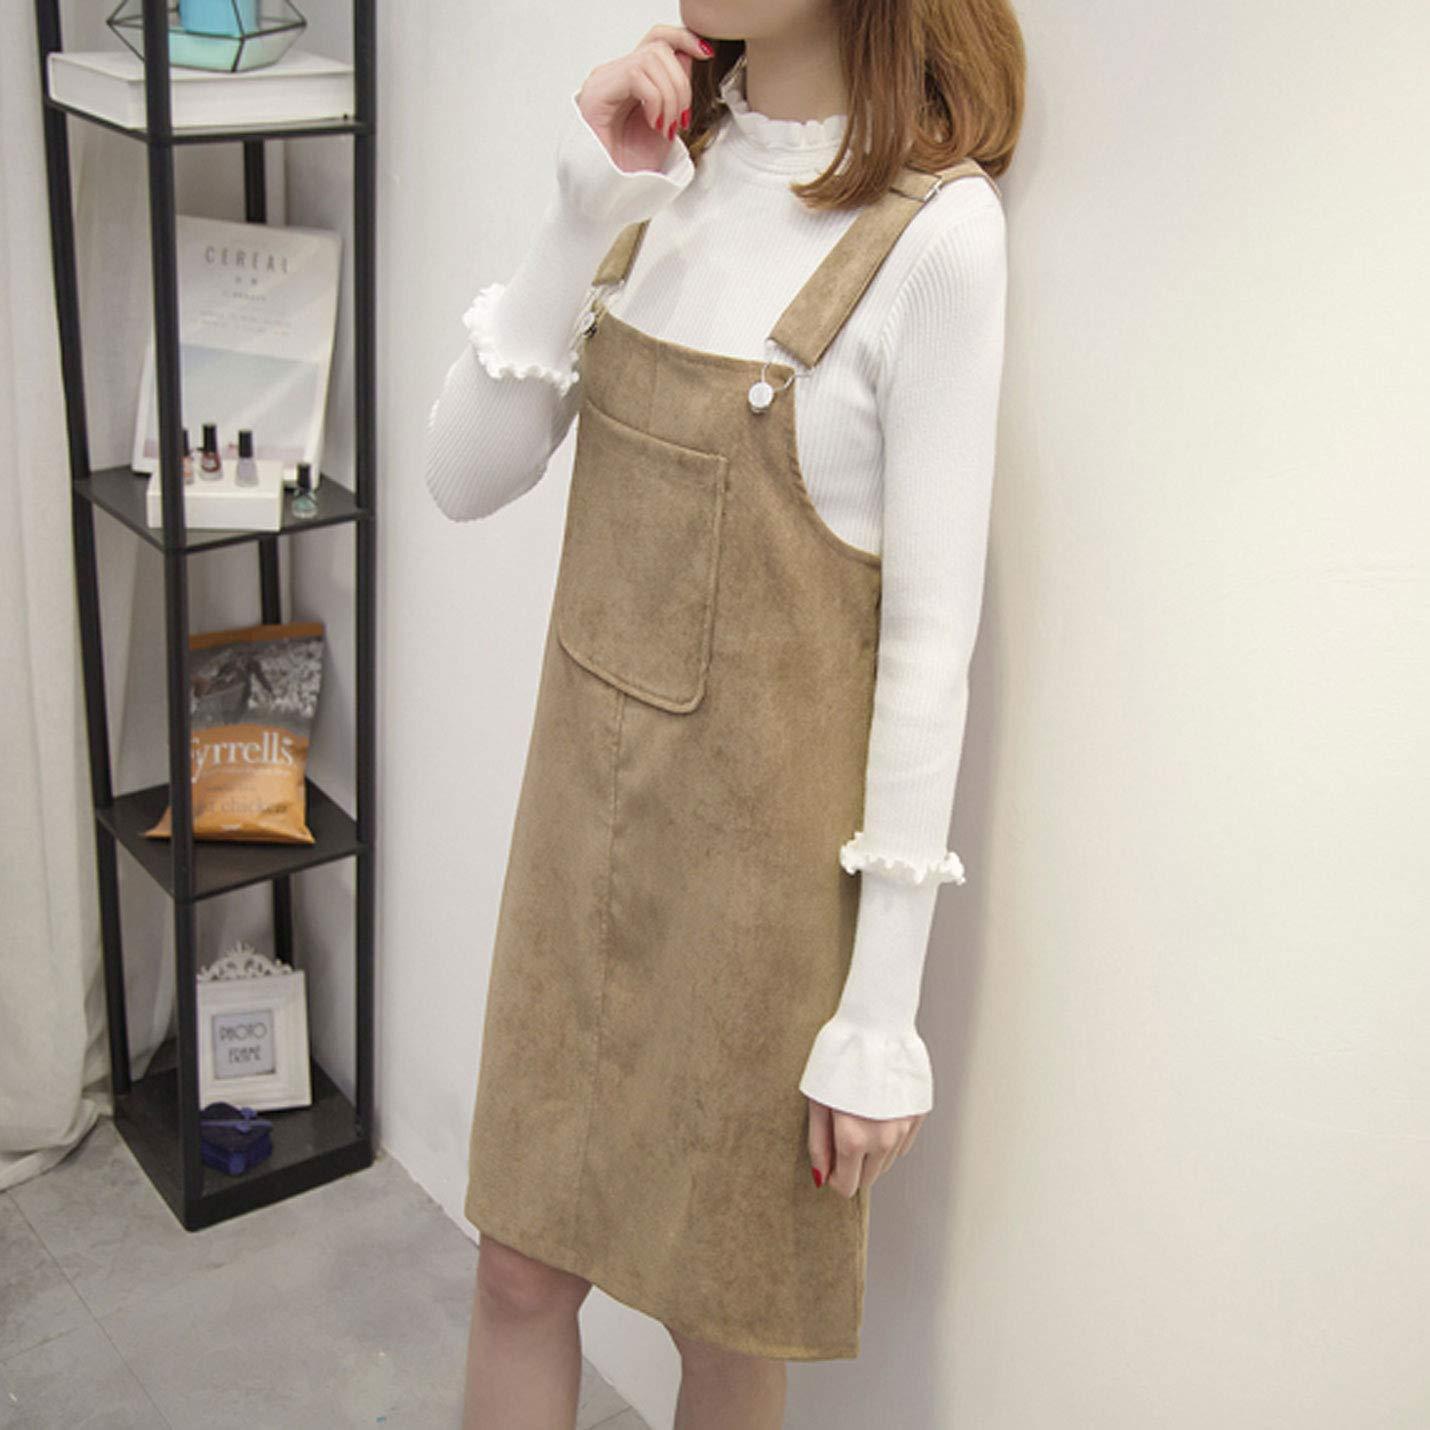 a076ddffbf Amazon.com  Flygo Women s Straps A-Line Corduroy Pinafore Bib Overall Dress  Suspender Skirt  Clothing